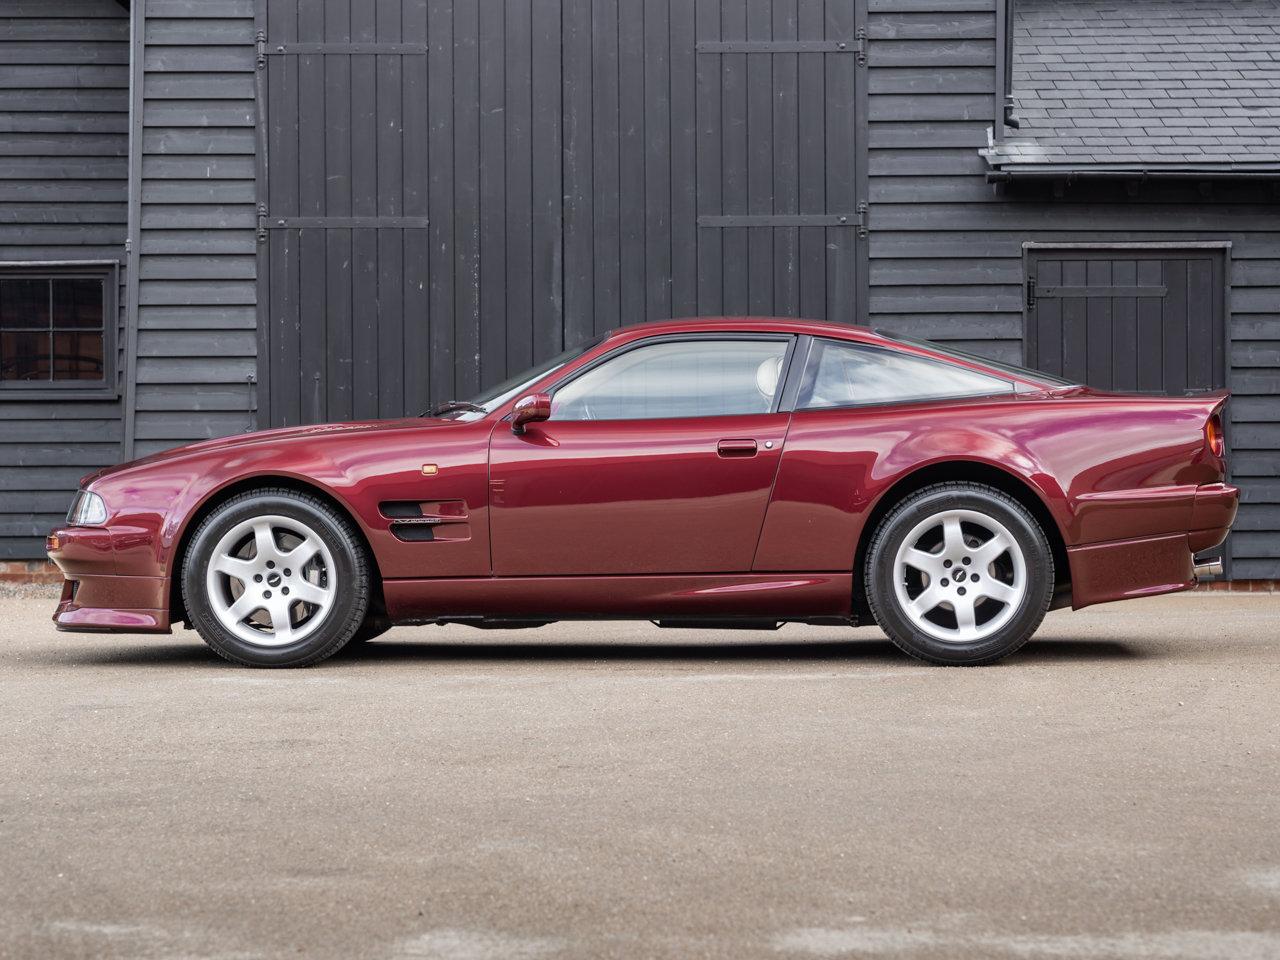 1996 Aston Martin Vantage V550 For Sale (picture 2 of 6)